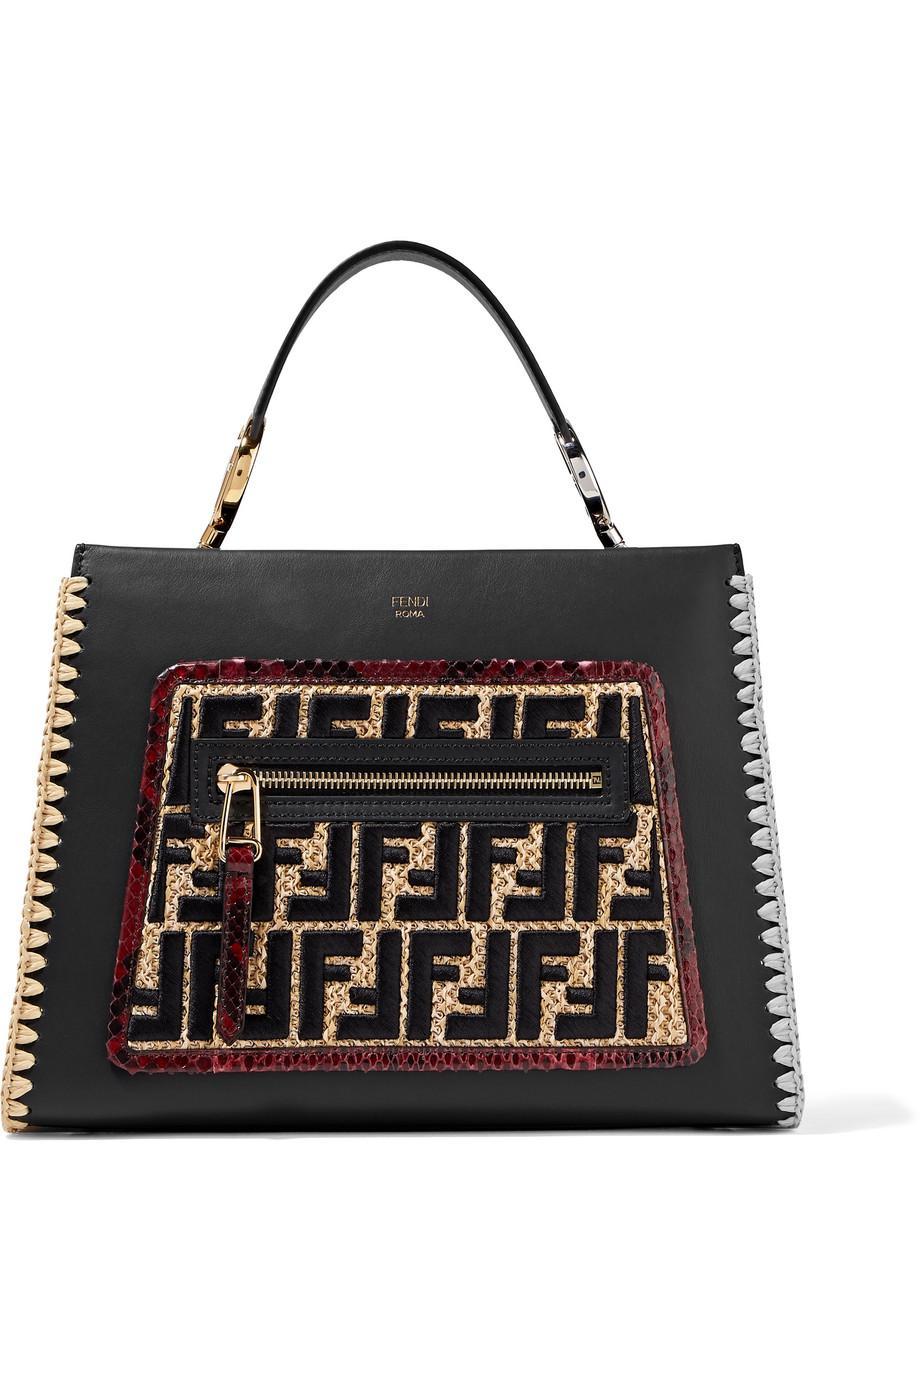 Runaway Small Python And Raffia-trimmed Leather Tote - Black Fendi HeCxTl6wi